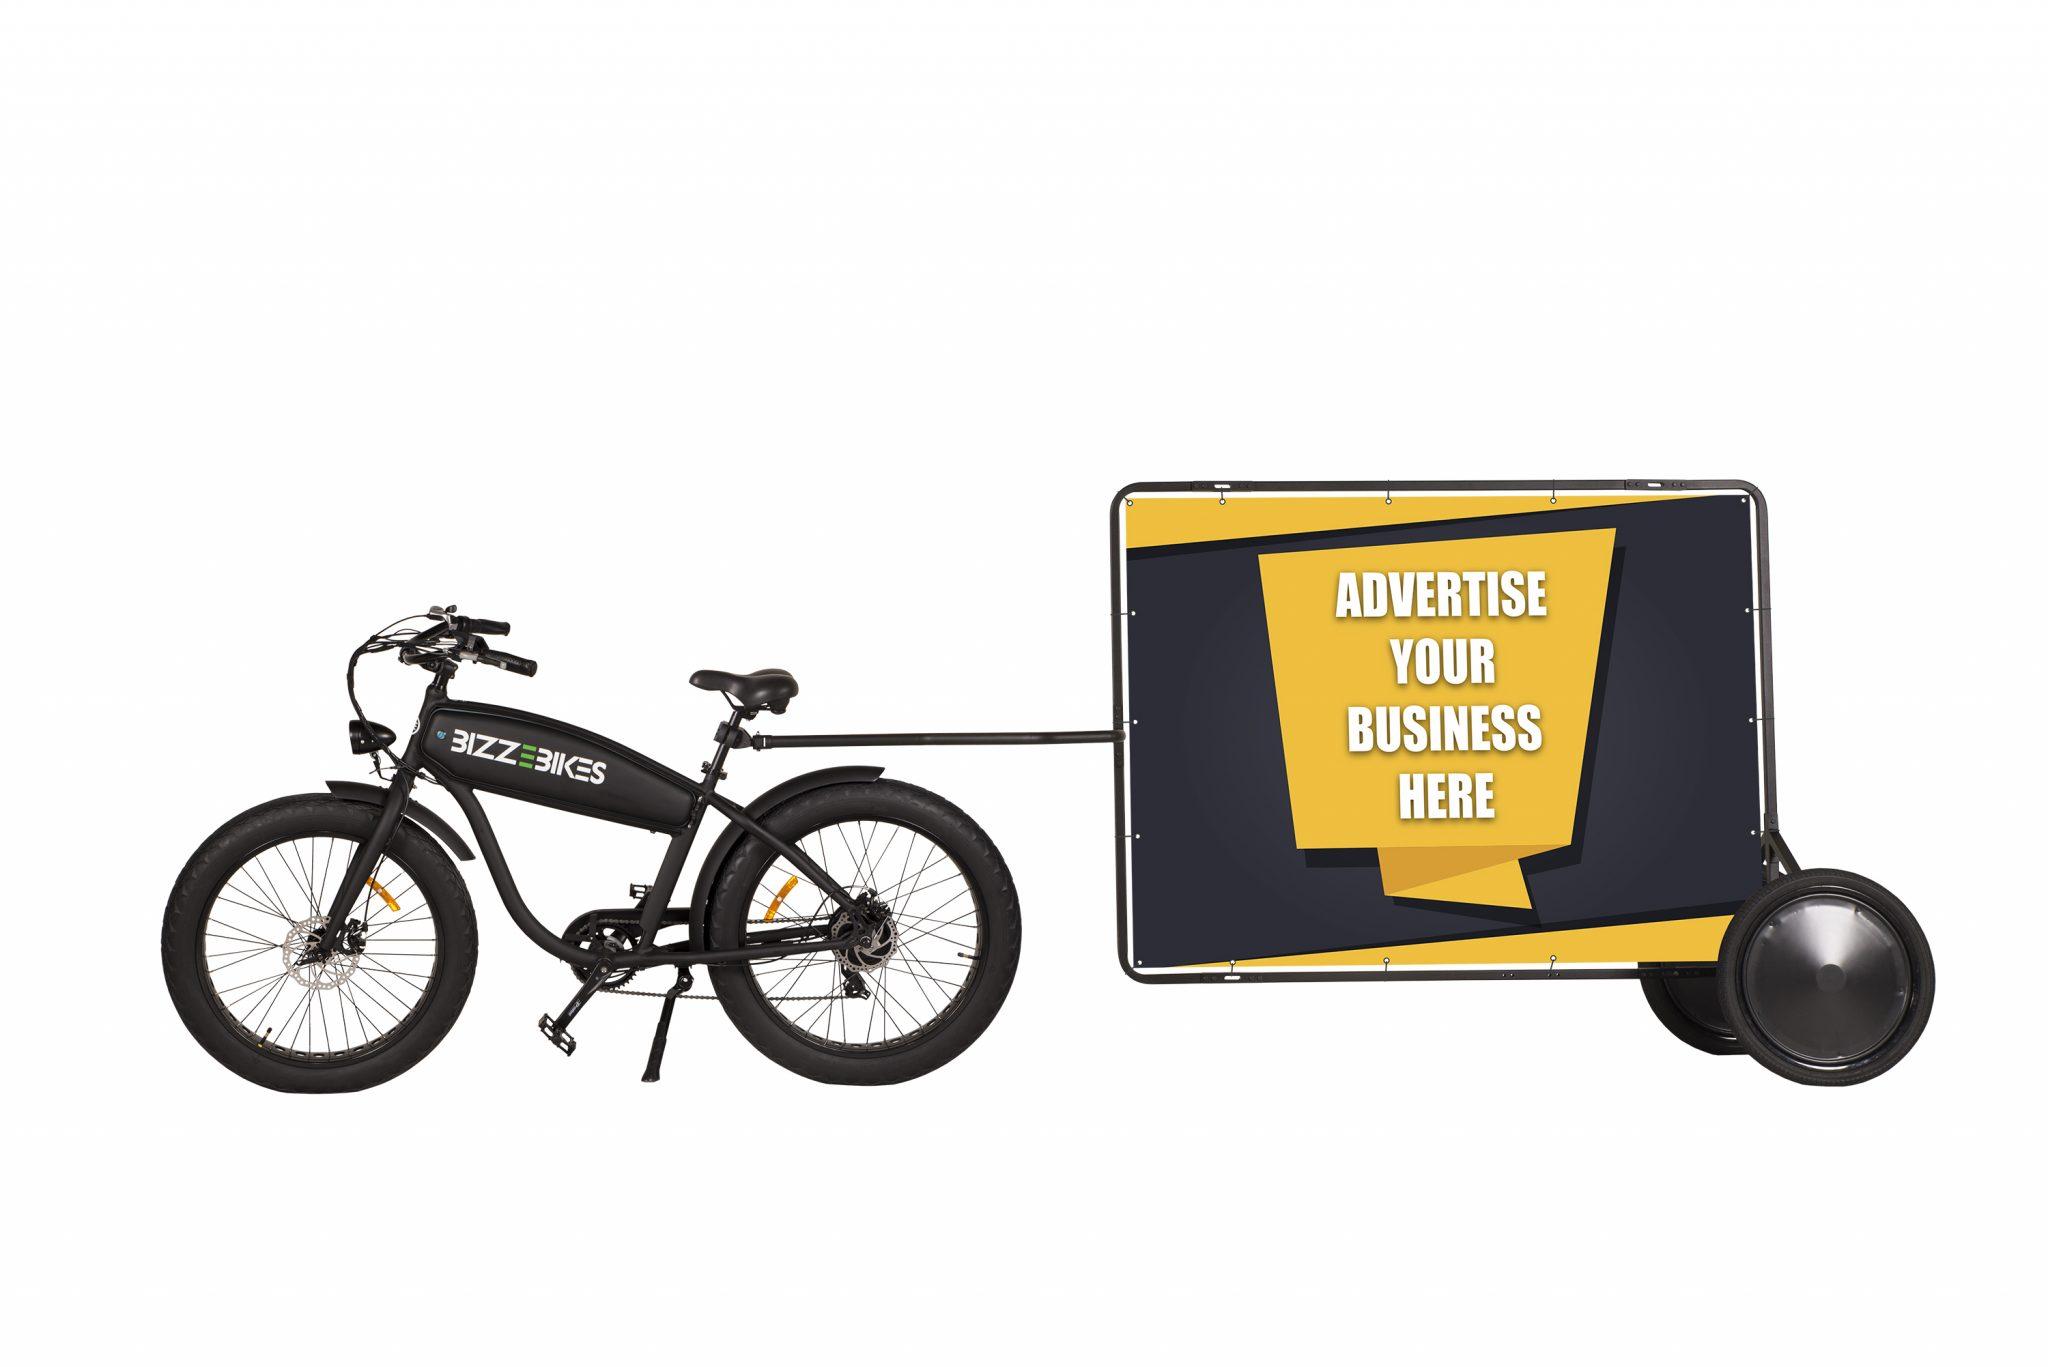 Bike Advertising Trailer